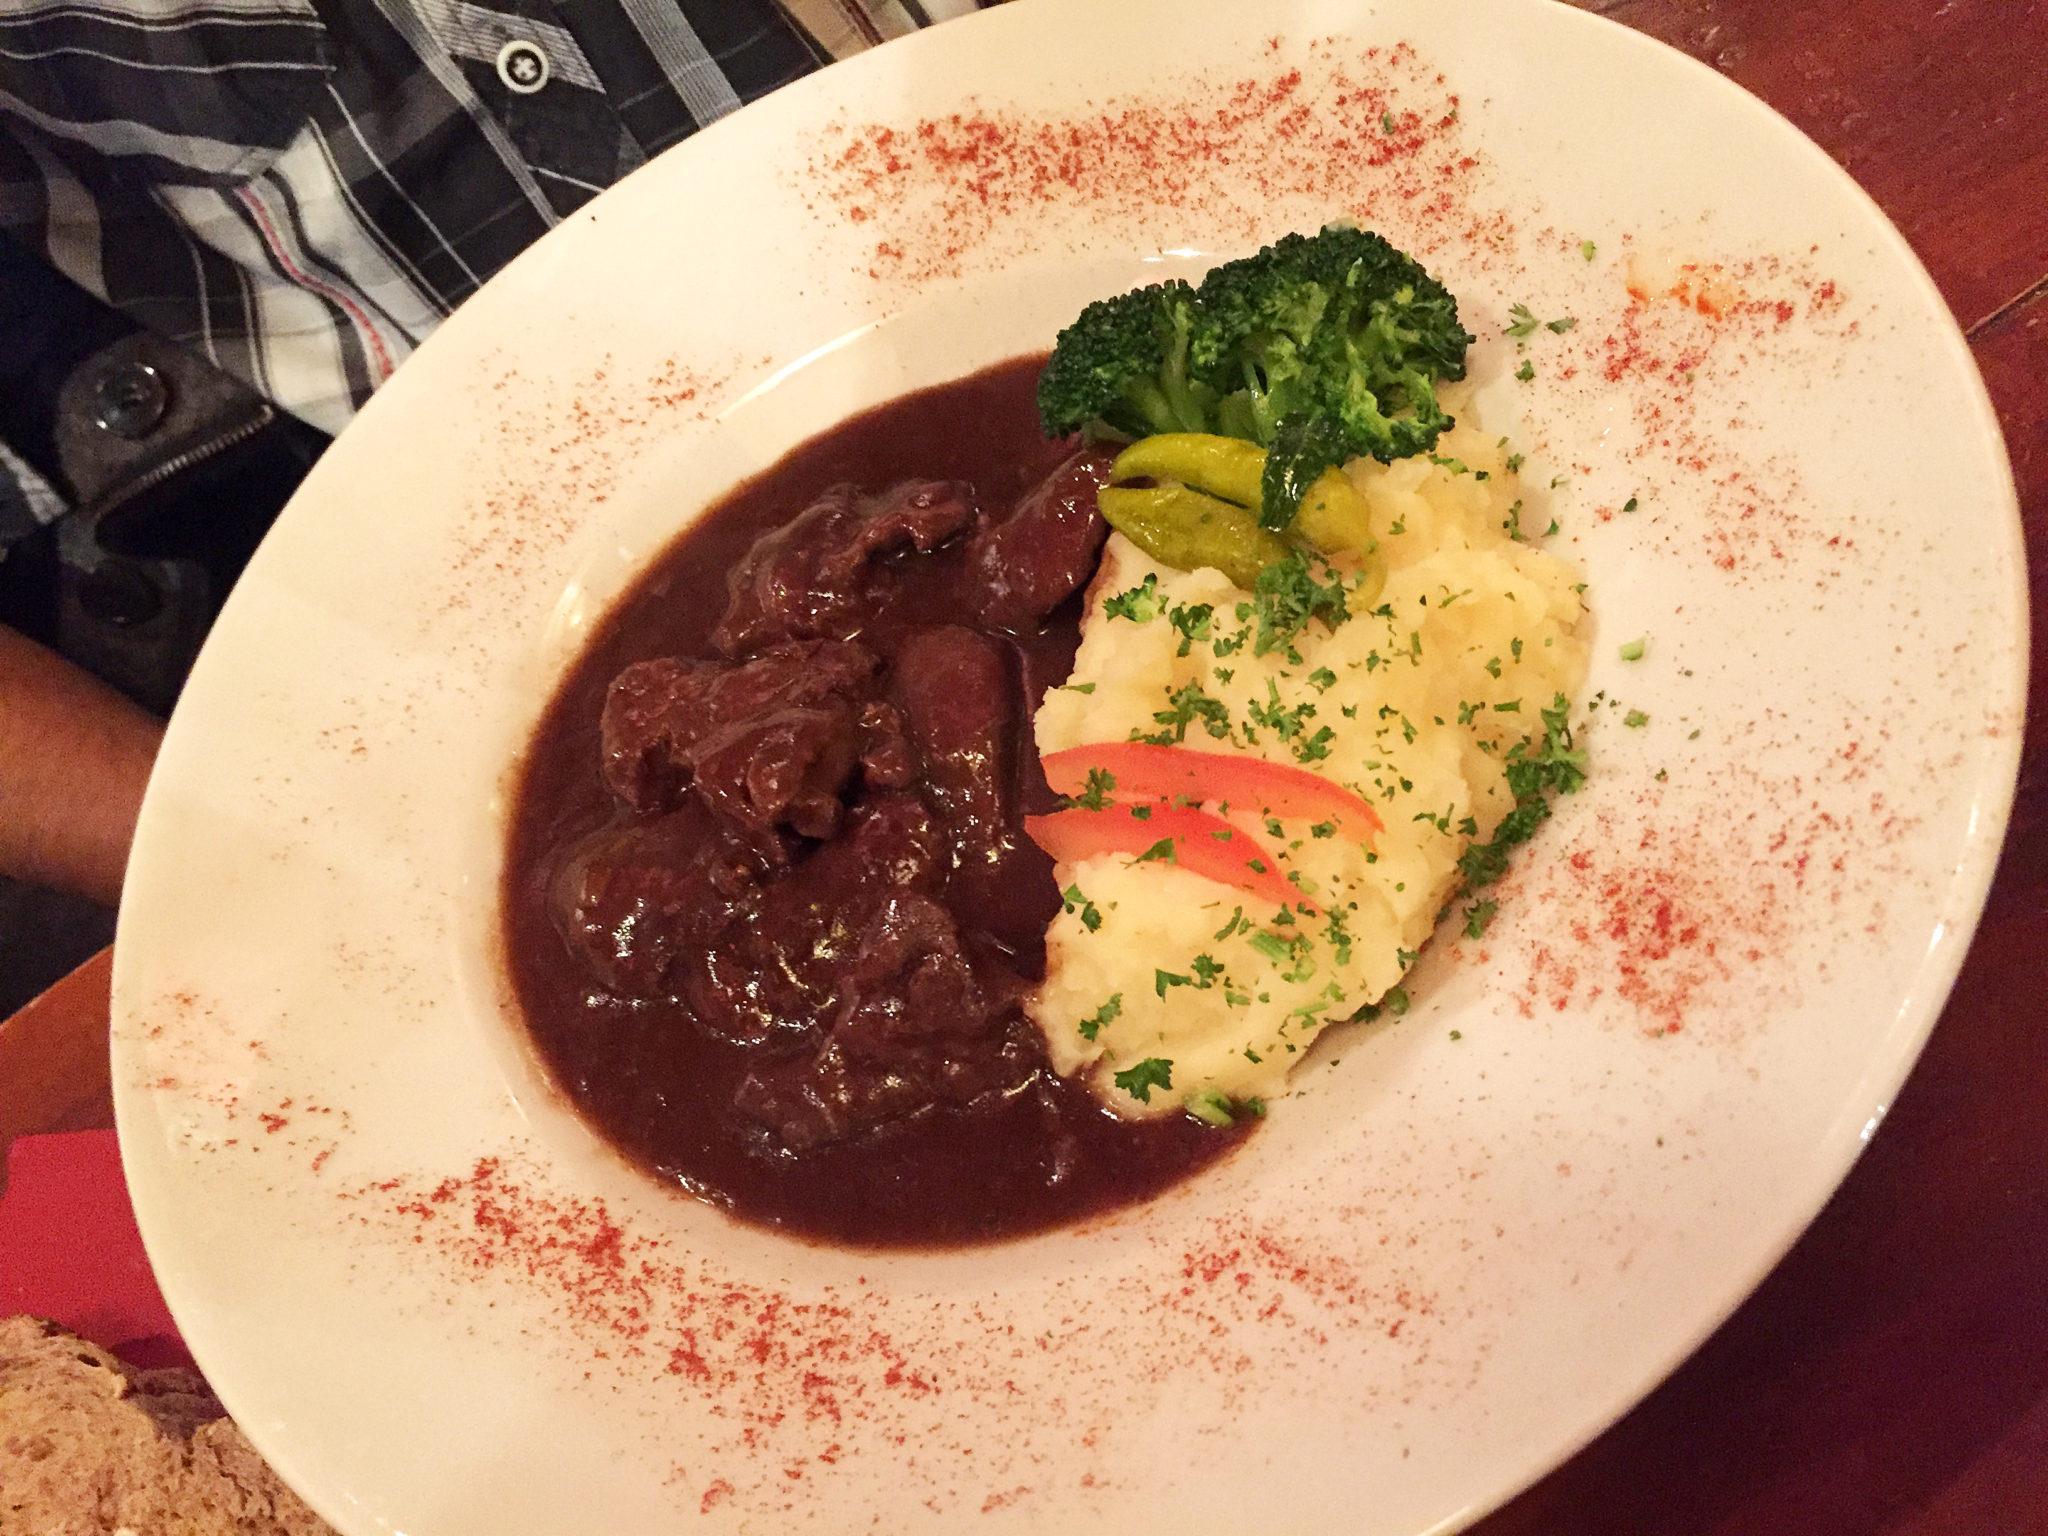 Hema_Bruxelles_bonnes_adresses_9_et_voisins_restaurant_carbonnade_flamande